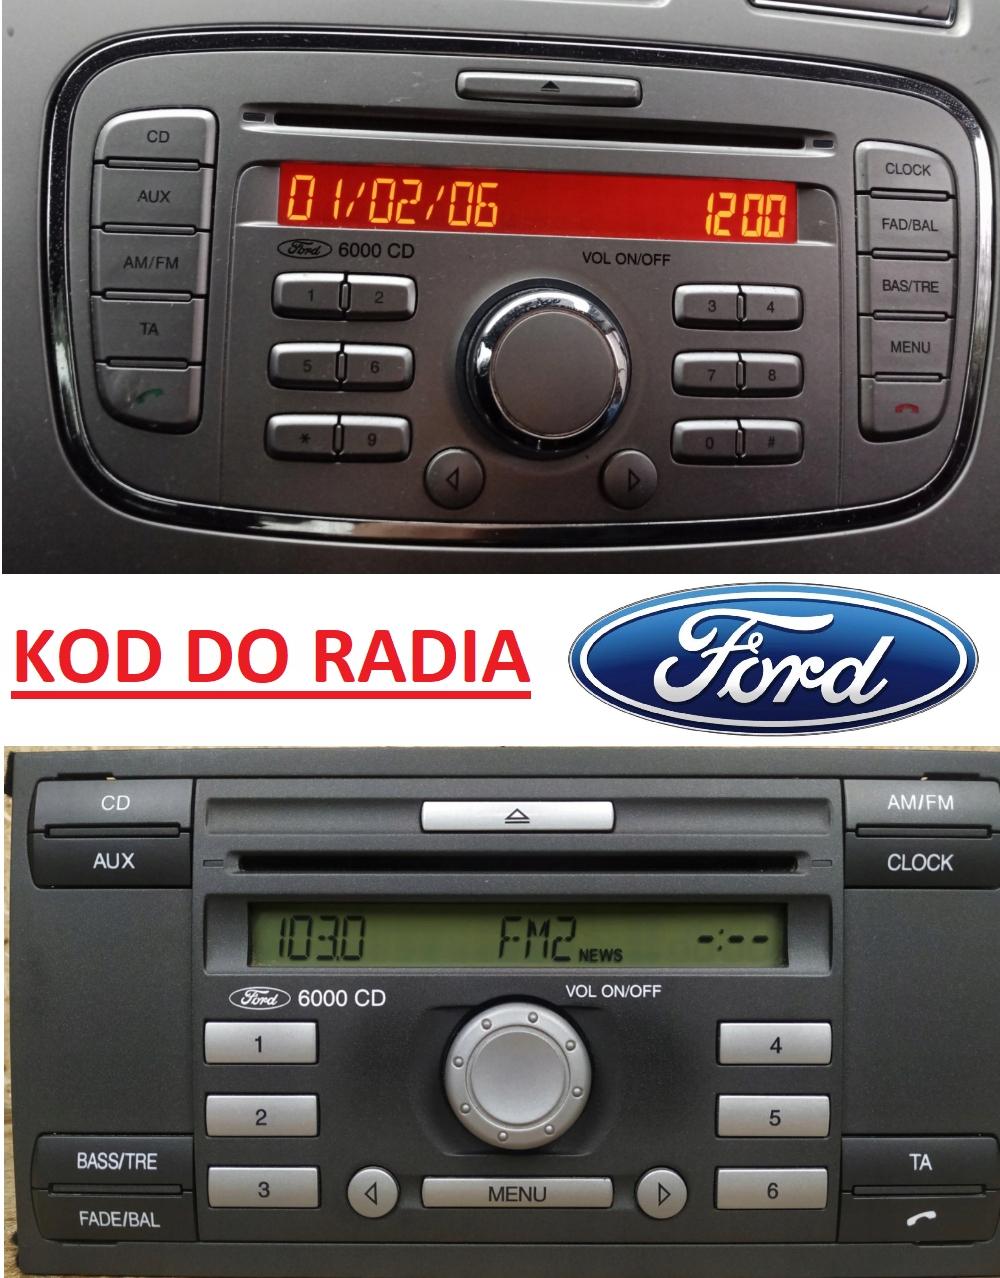 код к радио генератор ford focus mondeo fiesta